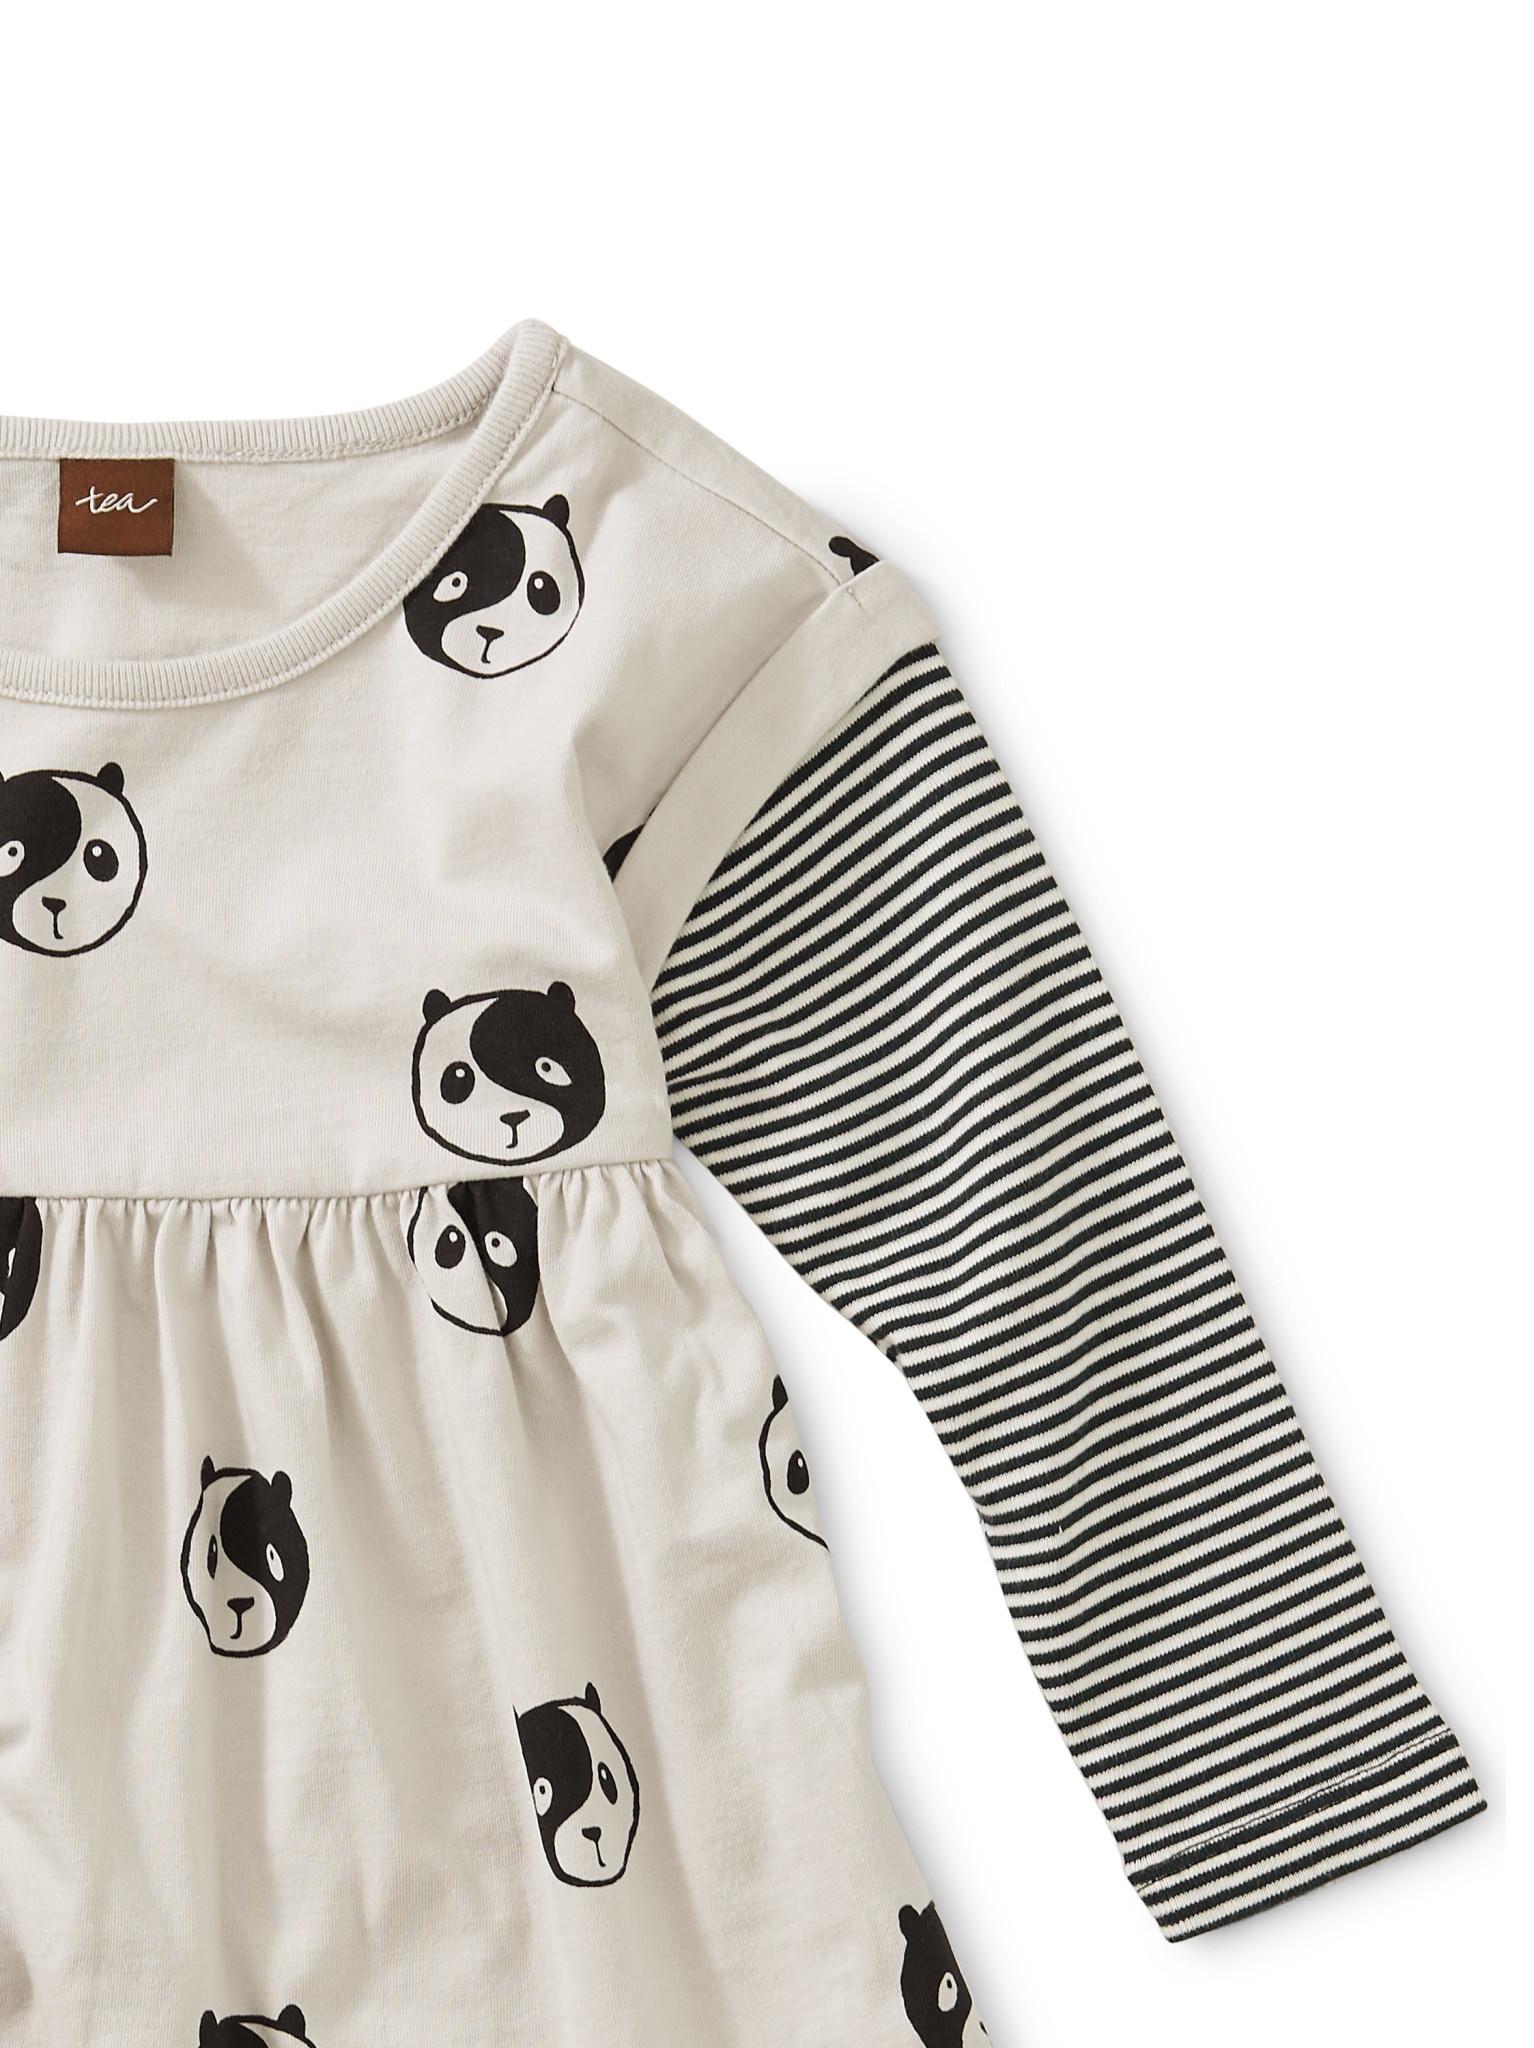 Tea Collection Printed Lyred Sleeve Bby Dress- Ying Yang Panda